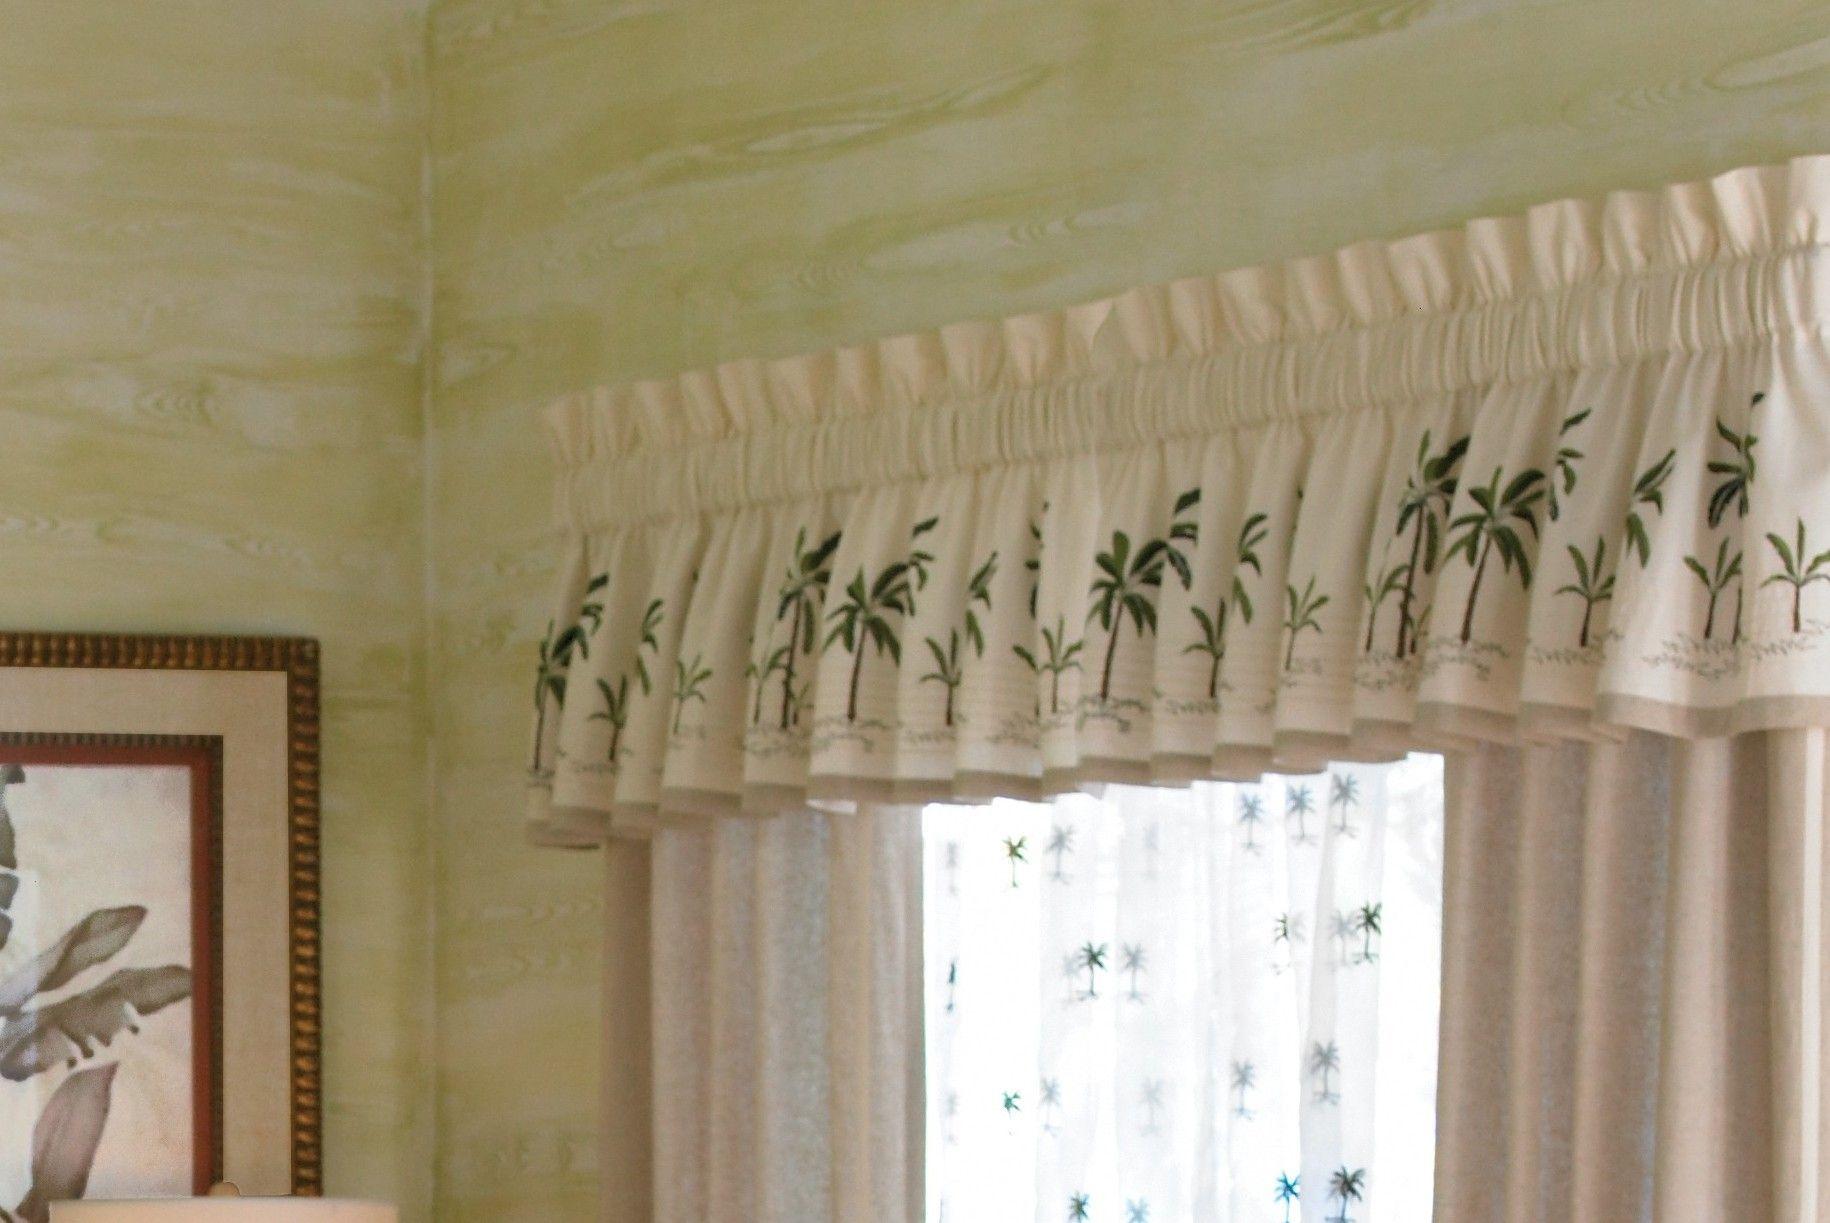 Croscill Fiji 82 Curtain Valance Curtains Curtain Valance Kitchen Curtains